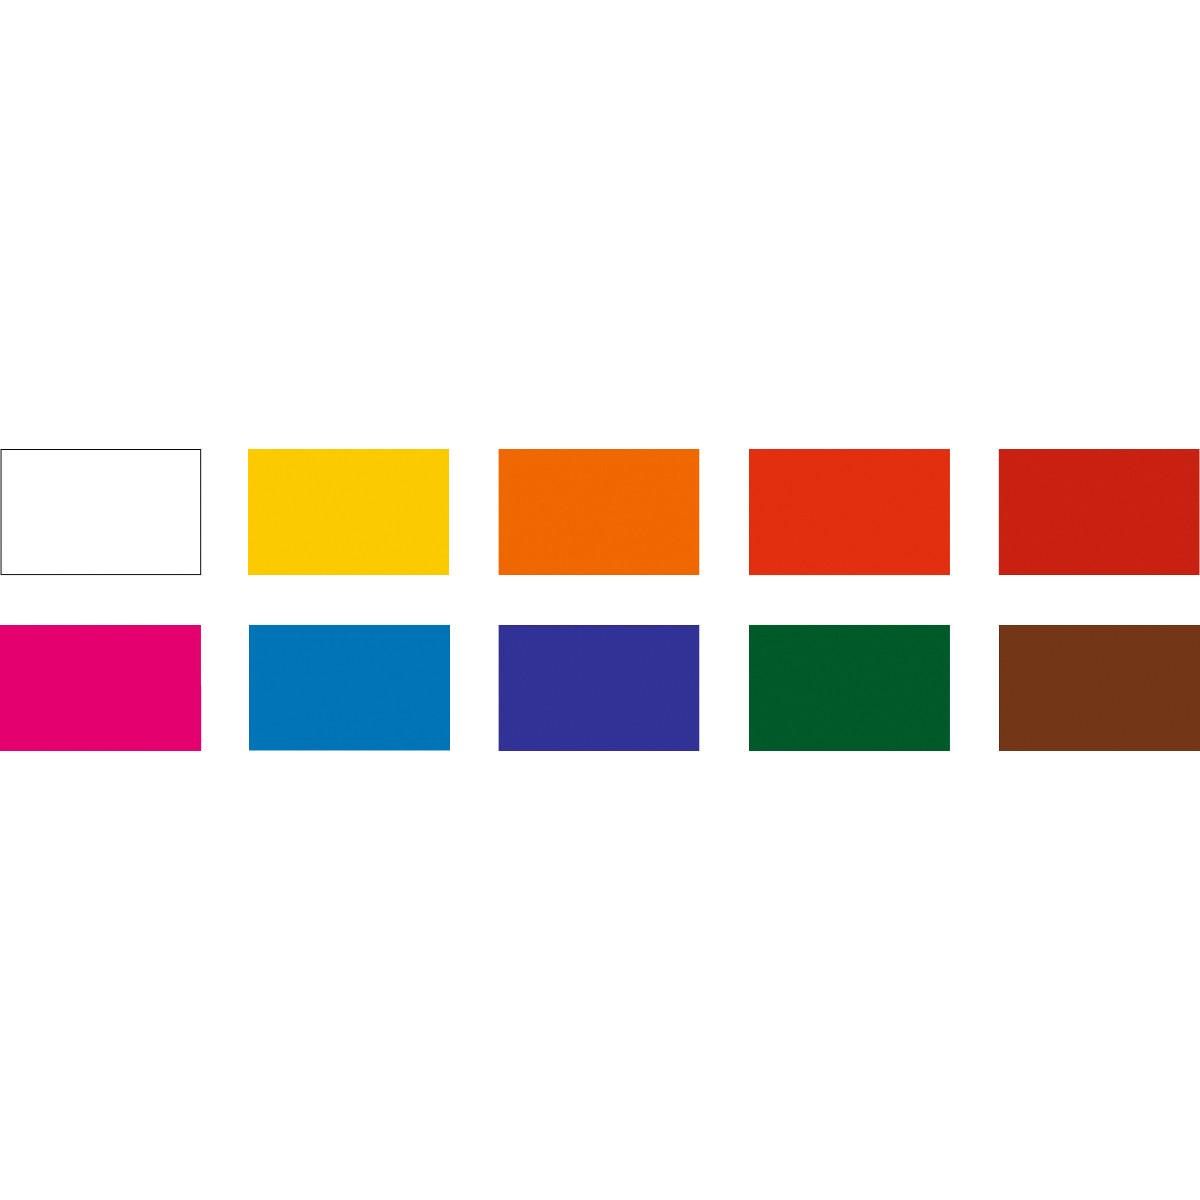 Transparente farbige Fensterfolie 23 x 33 cm - 20 Blatt sortiert